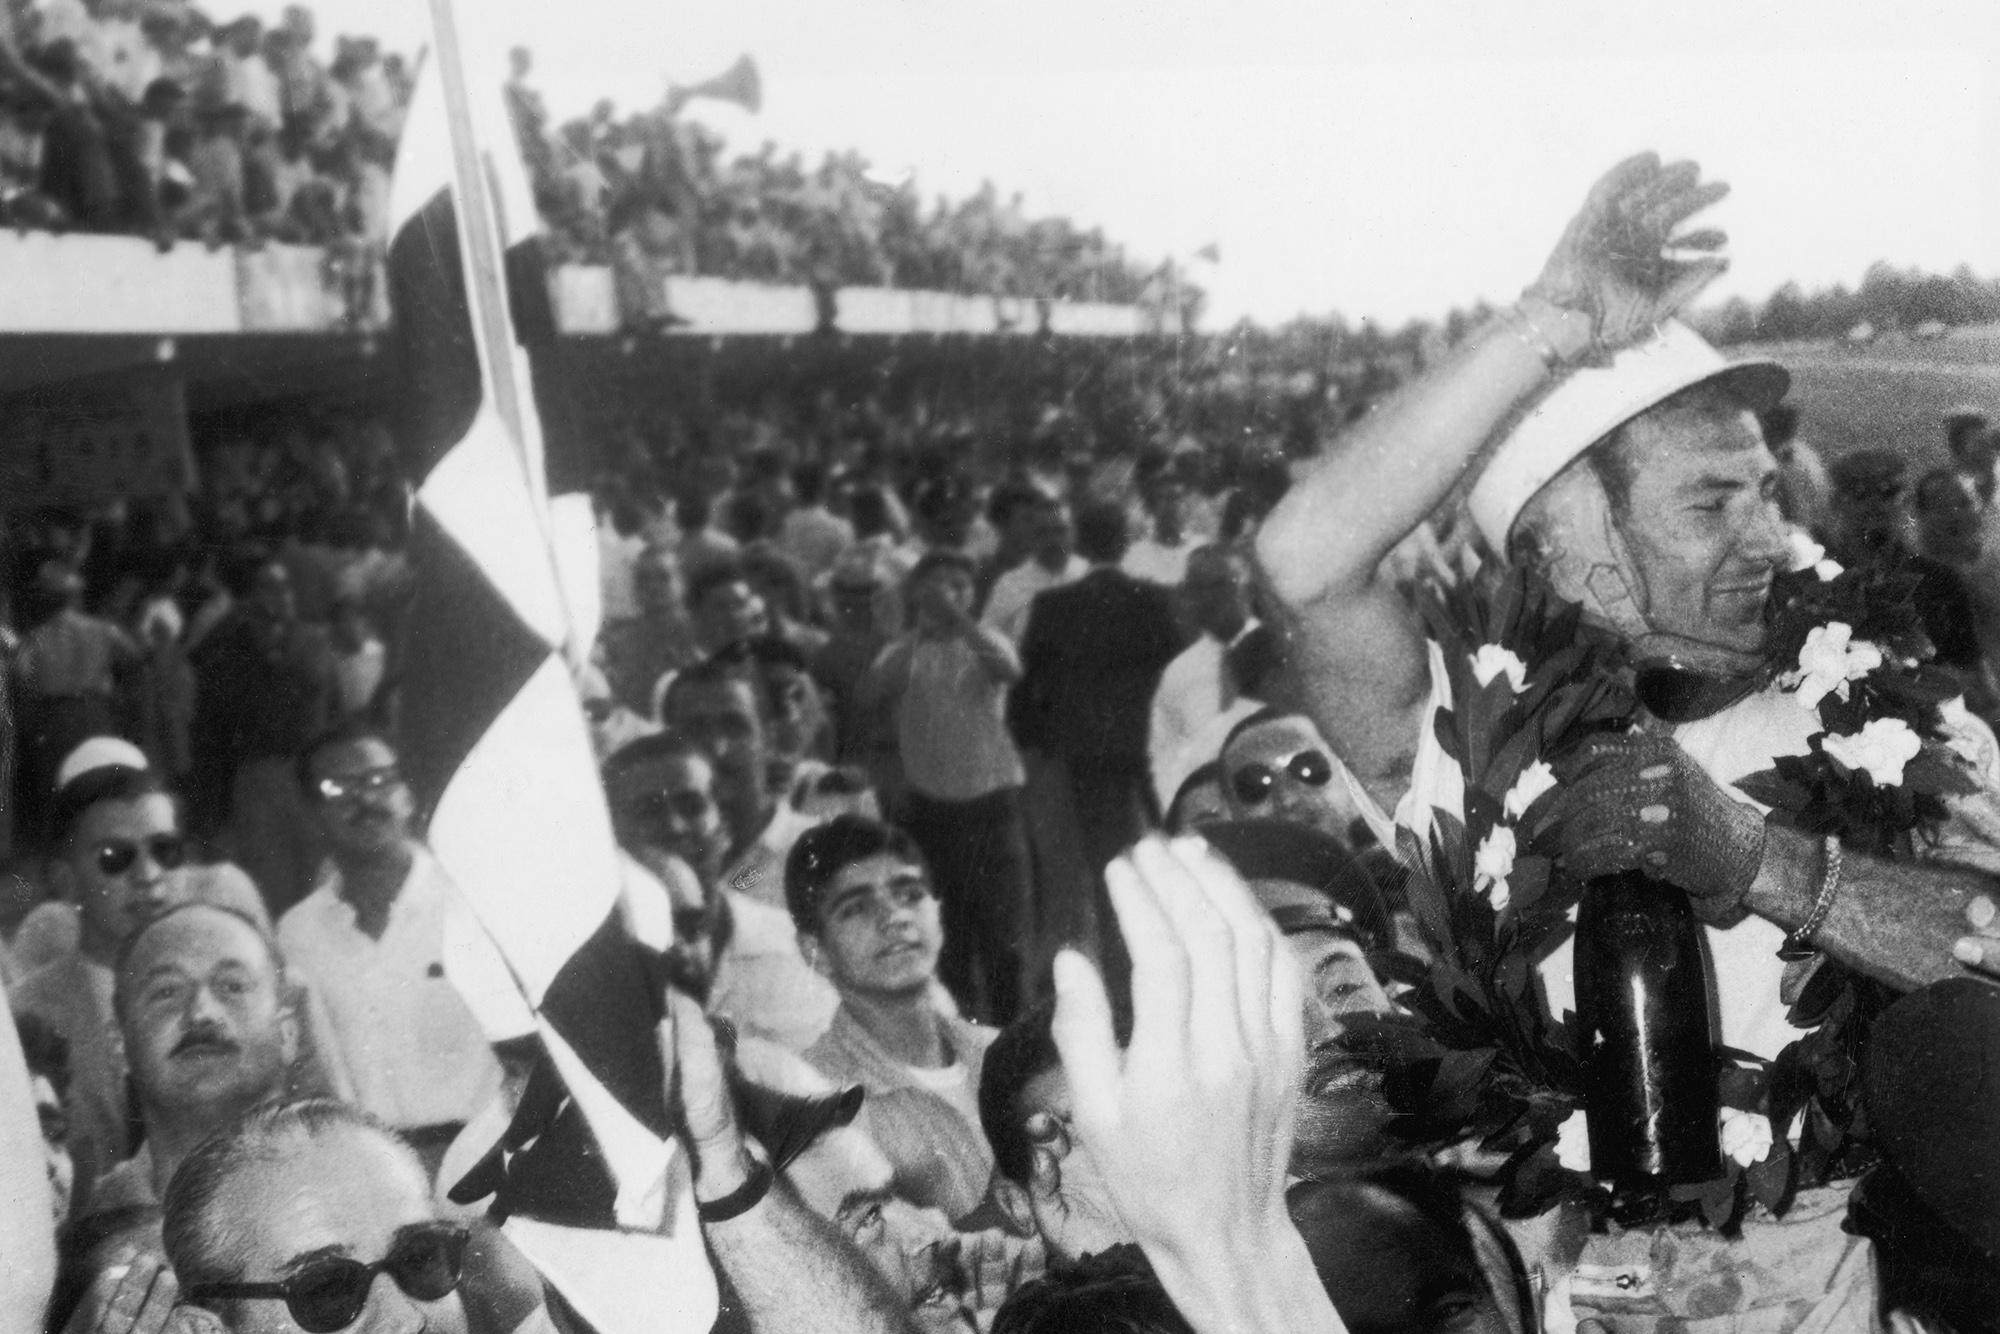 Stirling Moss celebrates winning the 1958 Argentine Grand Prix